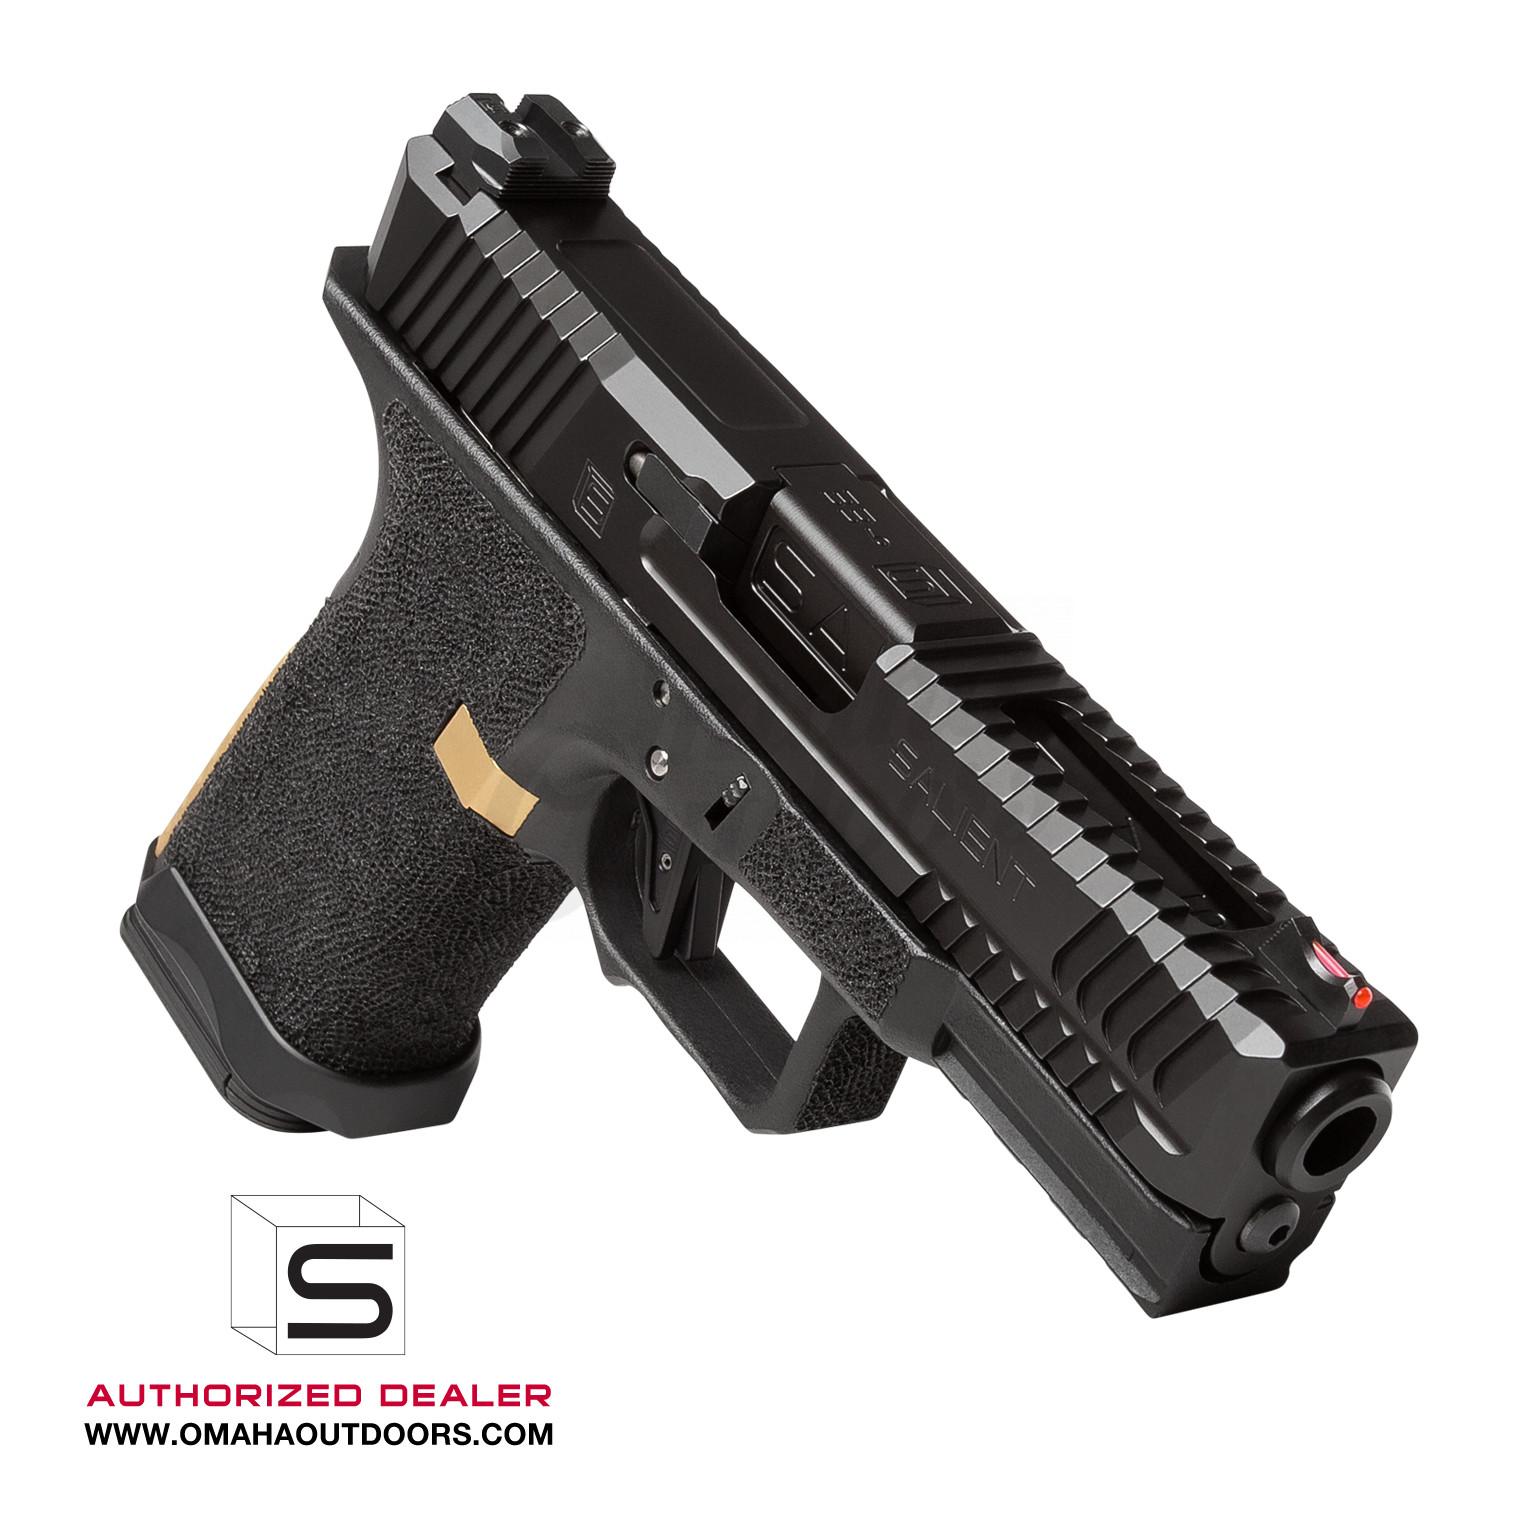 Salient Arms International BLU Compact Pistol 9mm 15 RD SAI-BLU9-C